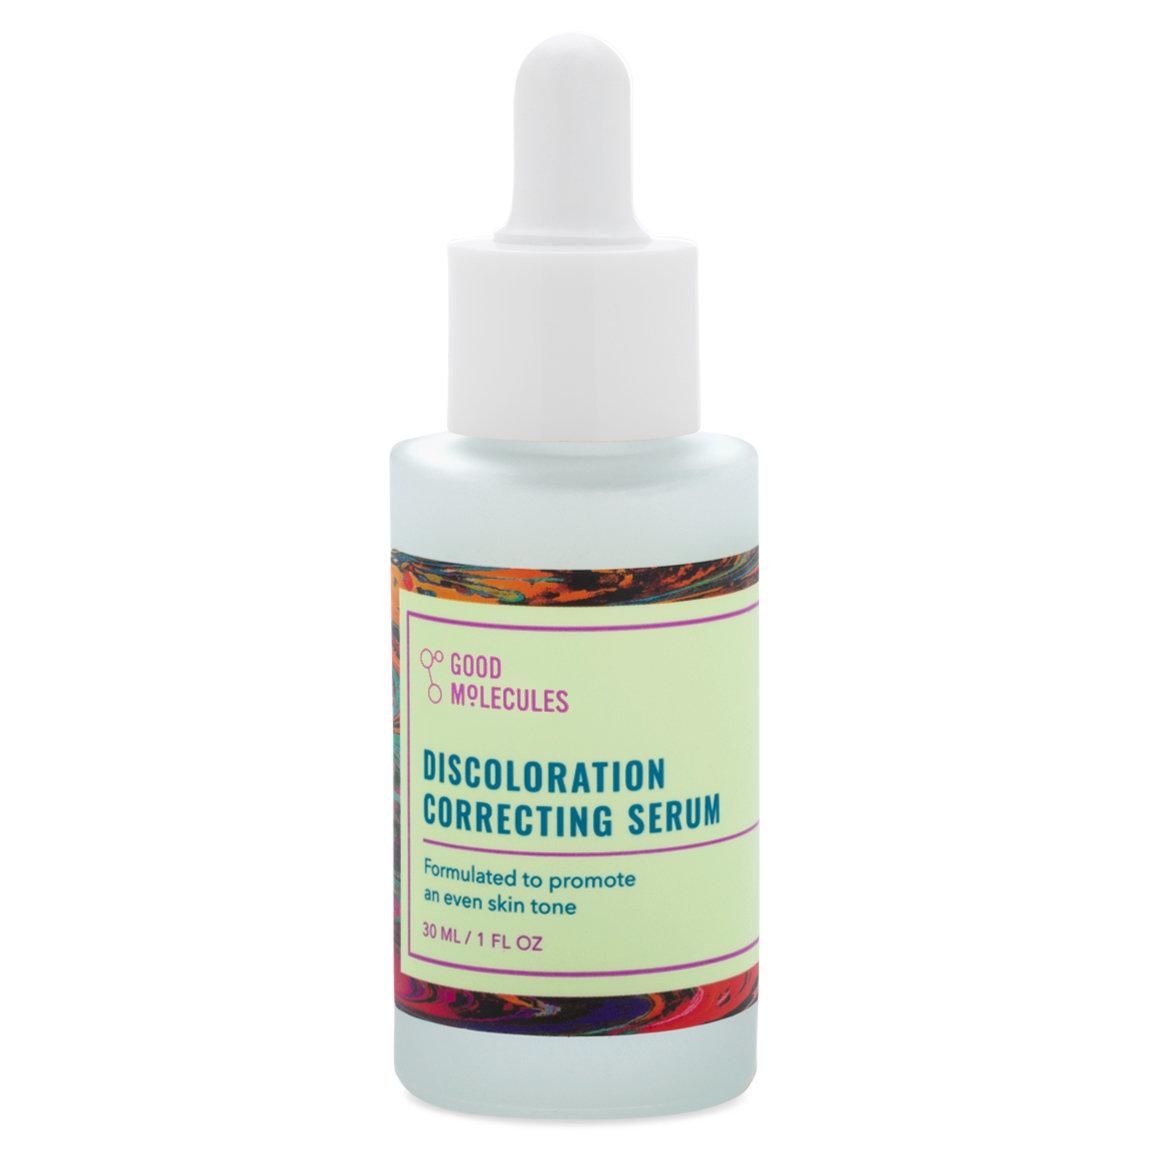 Good Molecules - Discoloration Correcting Serum